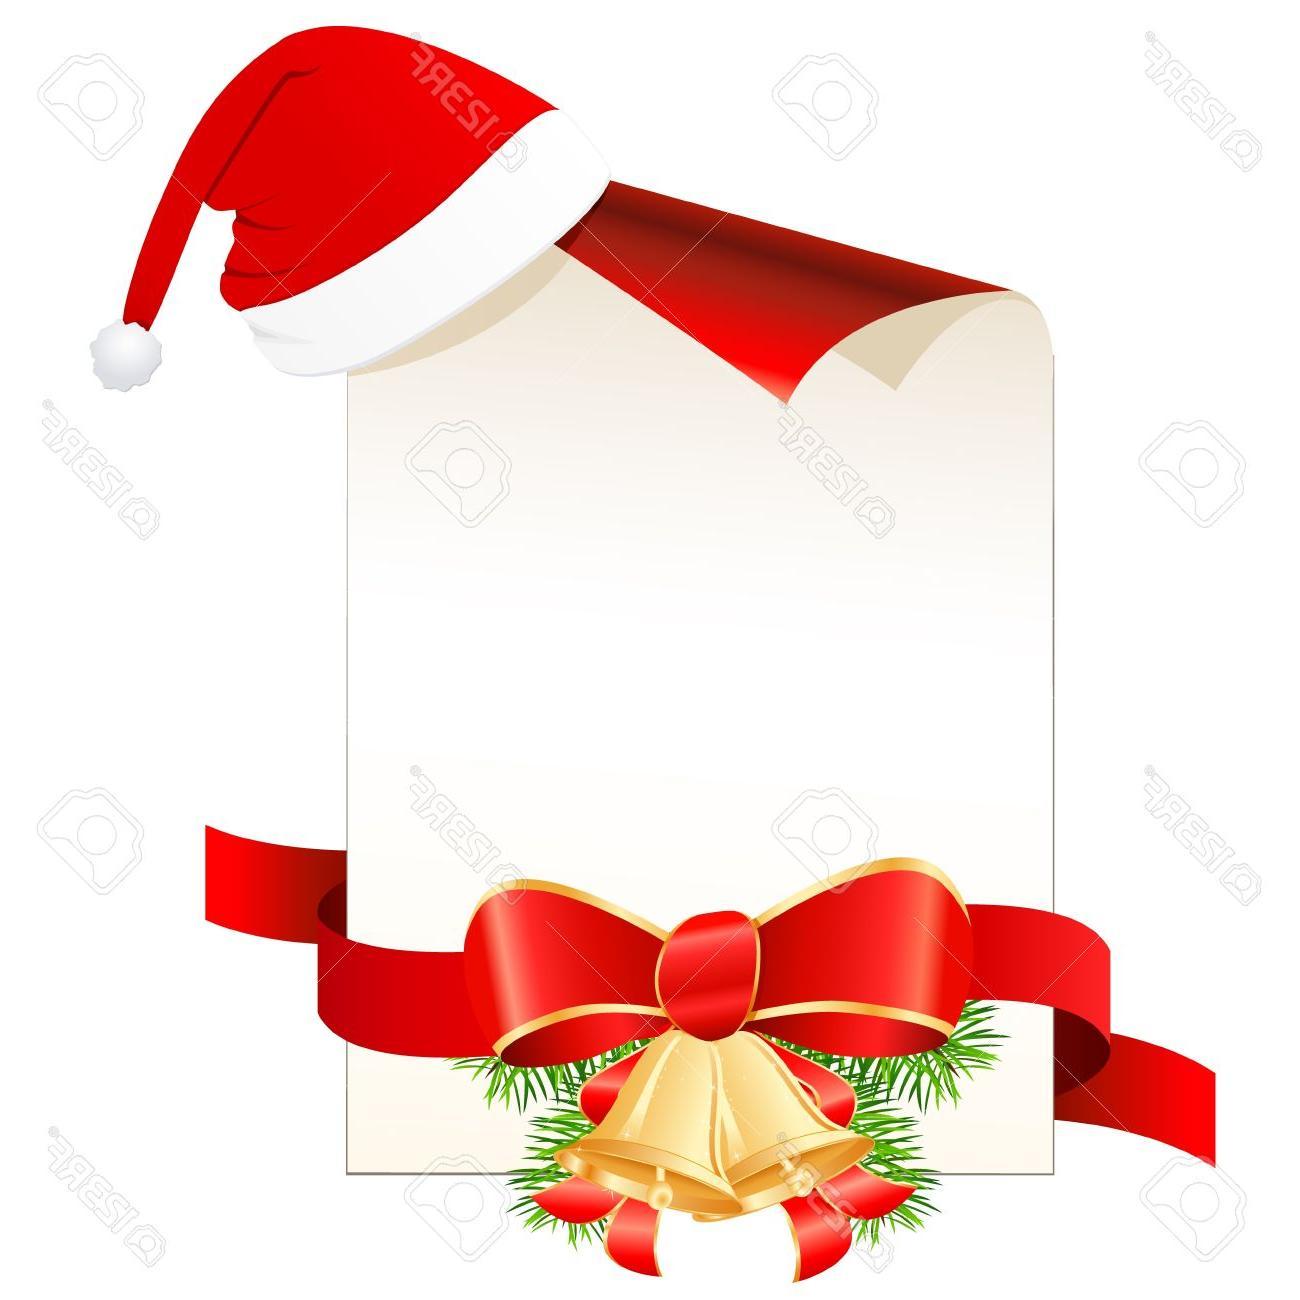 Unique Christmas List Clip Art Vector Image » Free Vector Art.